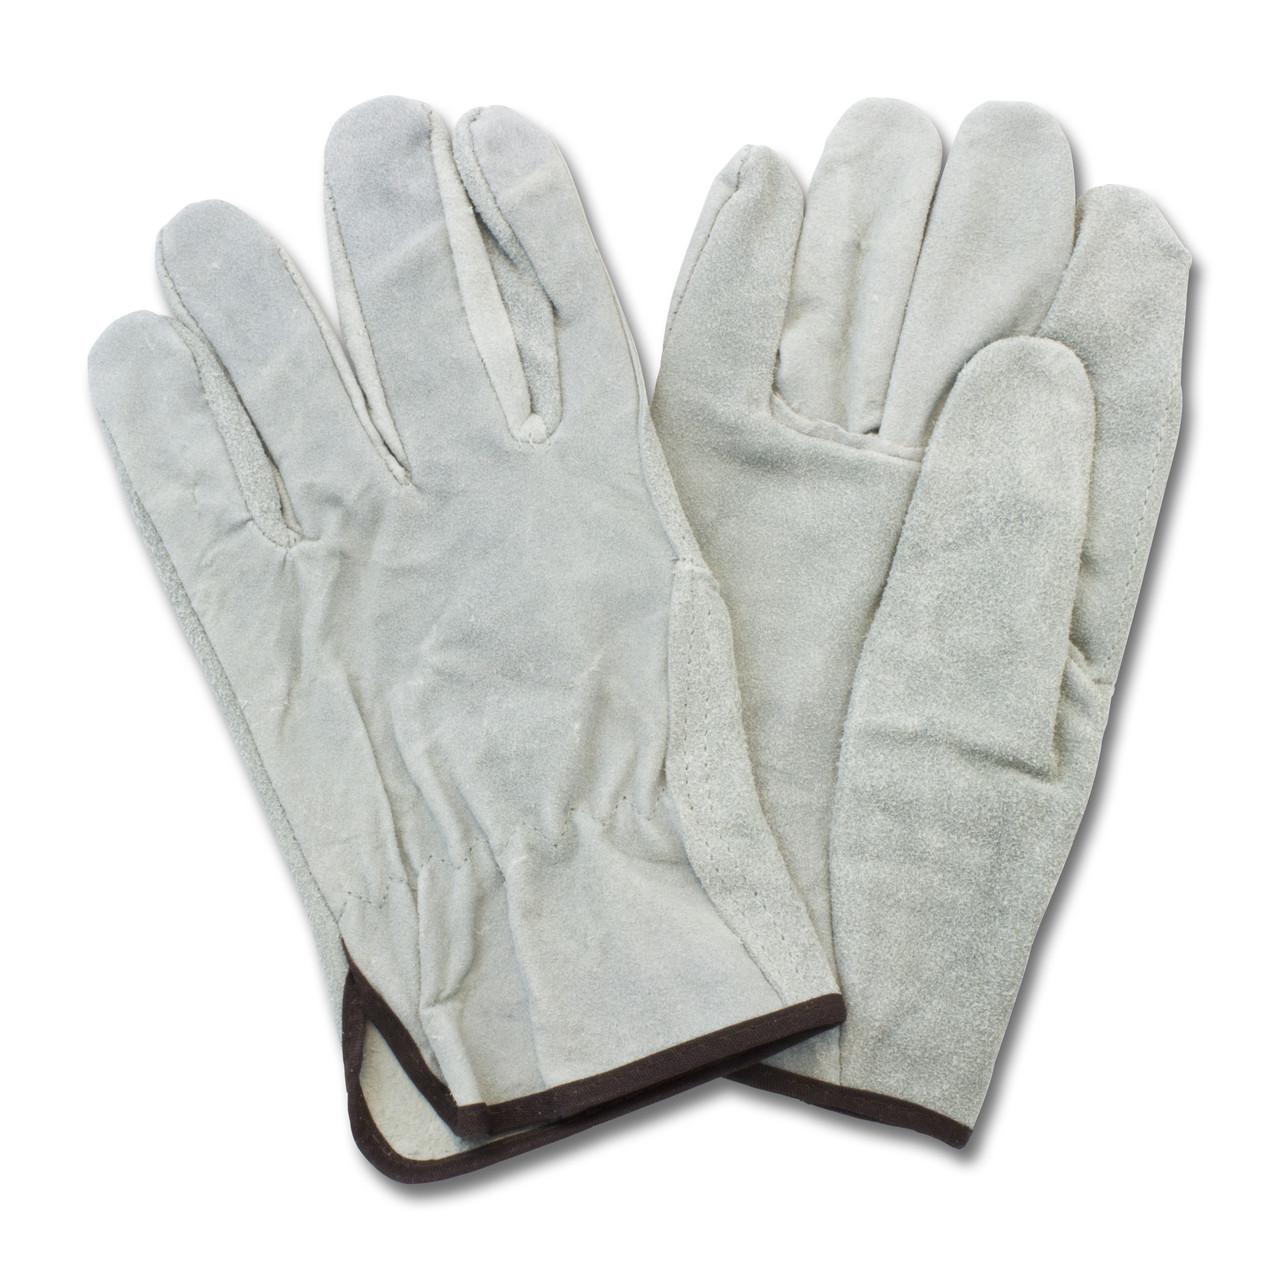 """A/B"" Grade Gunn Cut Gray Leather Drivers, Straight Thumb, 1DZ Pai"